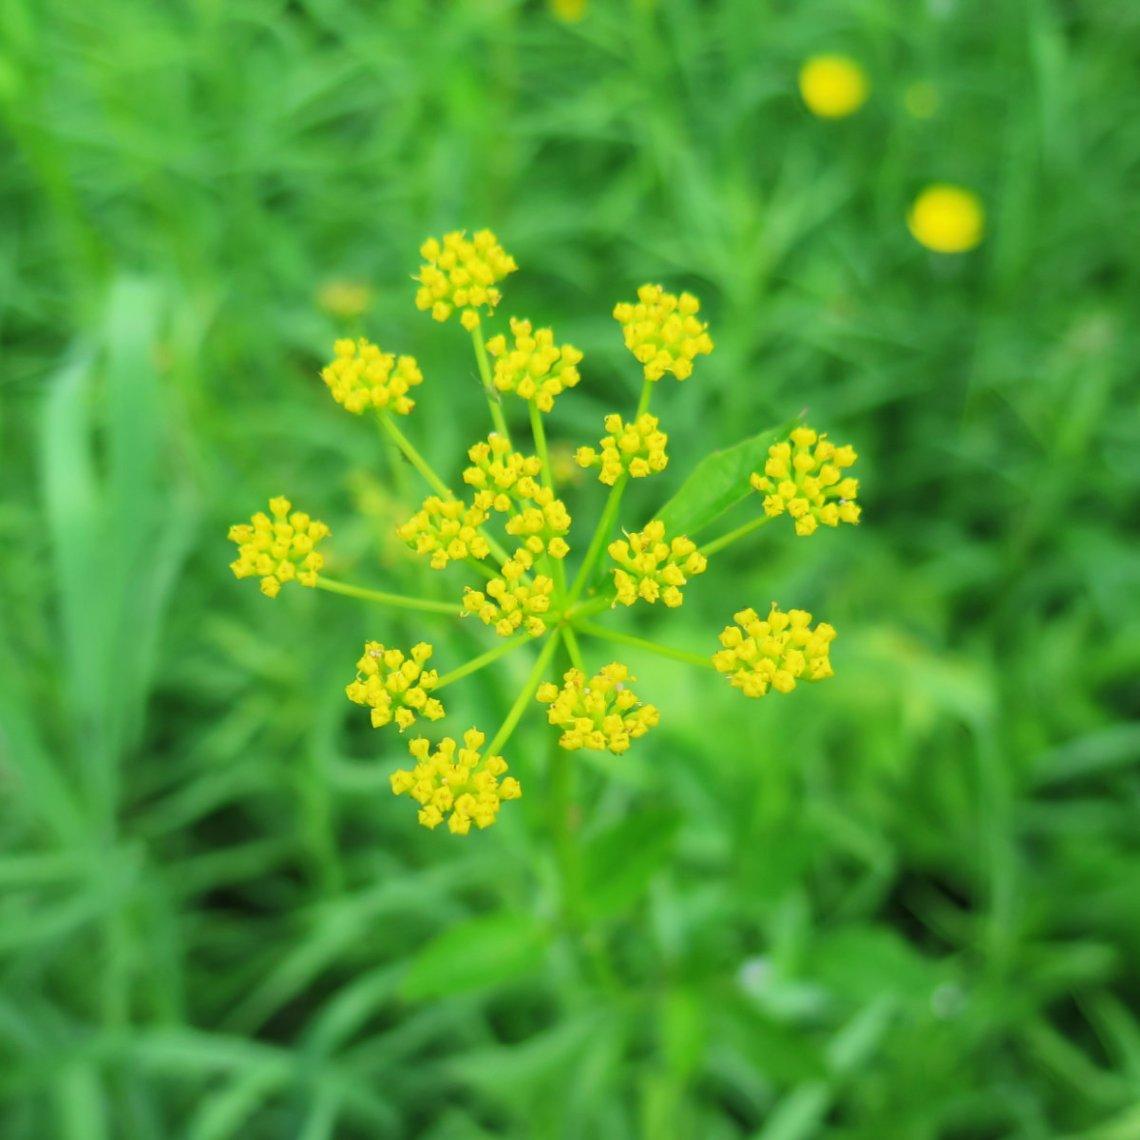 Yellow-Flower-20180618